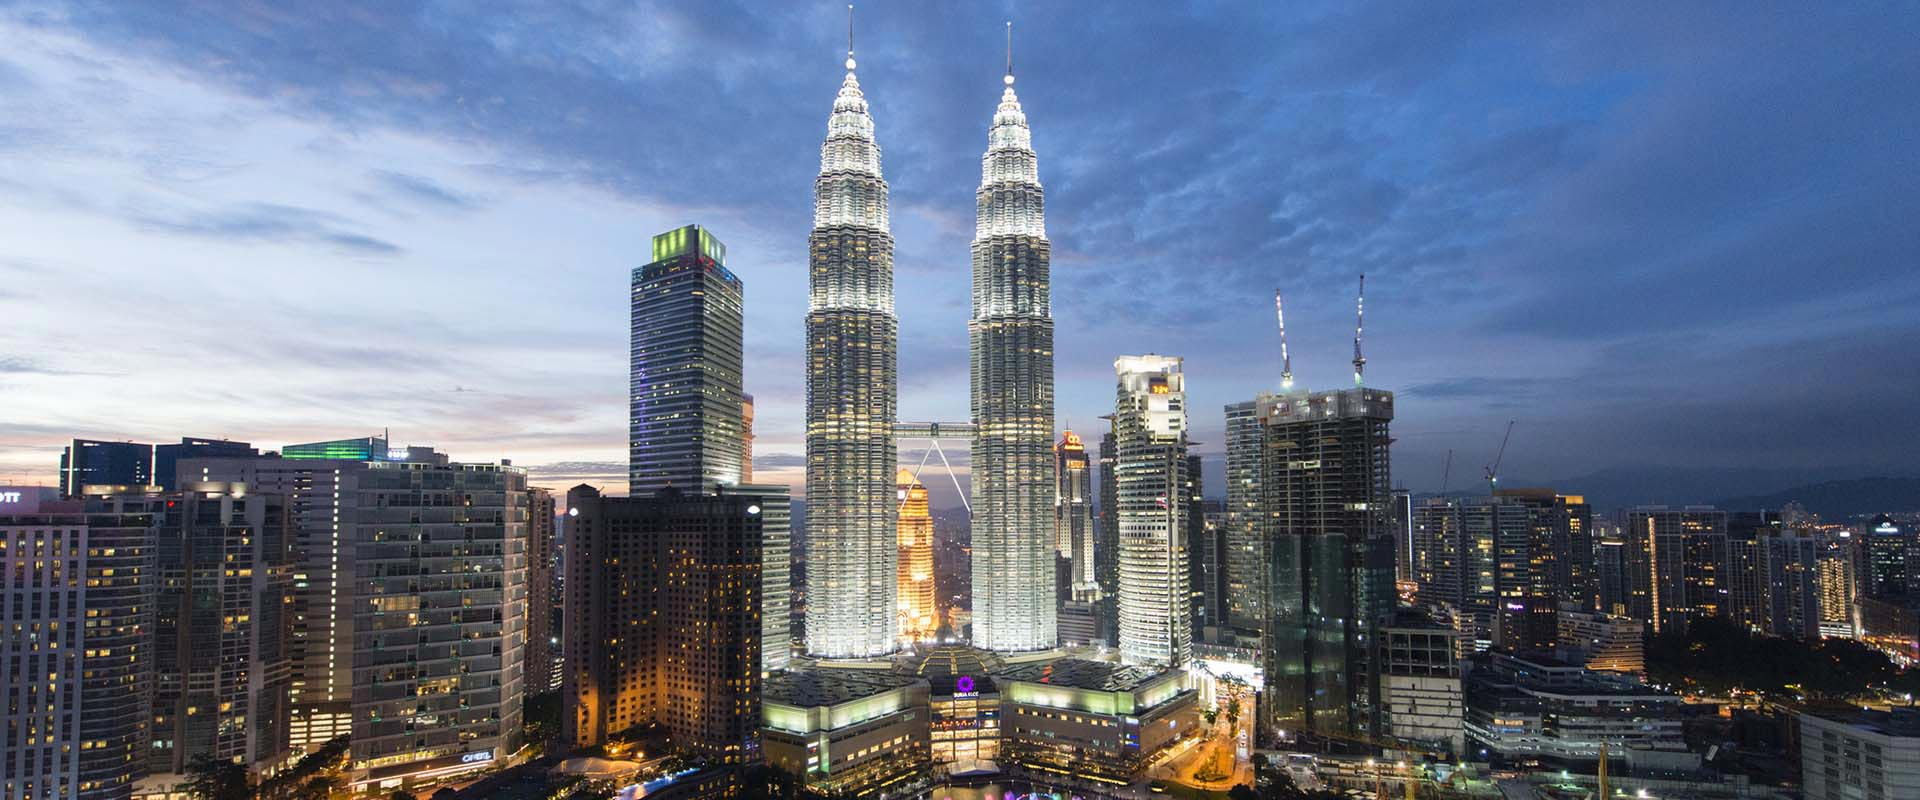 Kuala Lumpur Public Holidays 2021 Publicholidays Com My